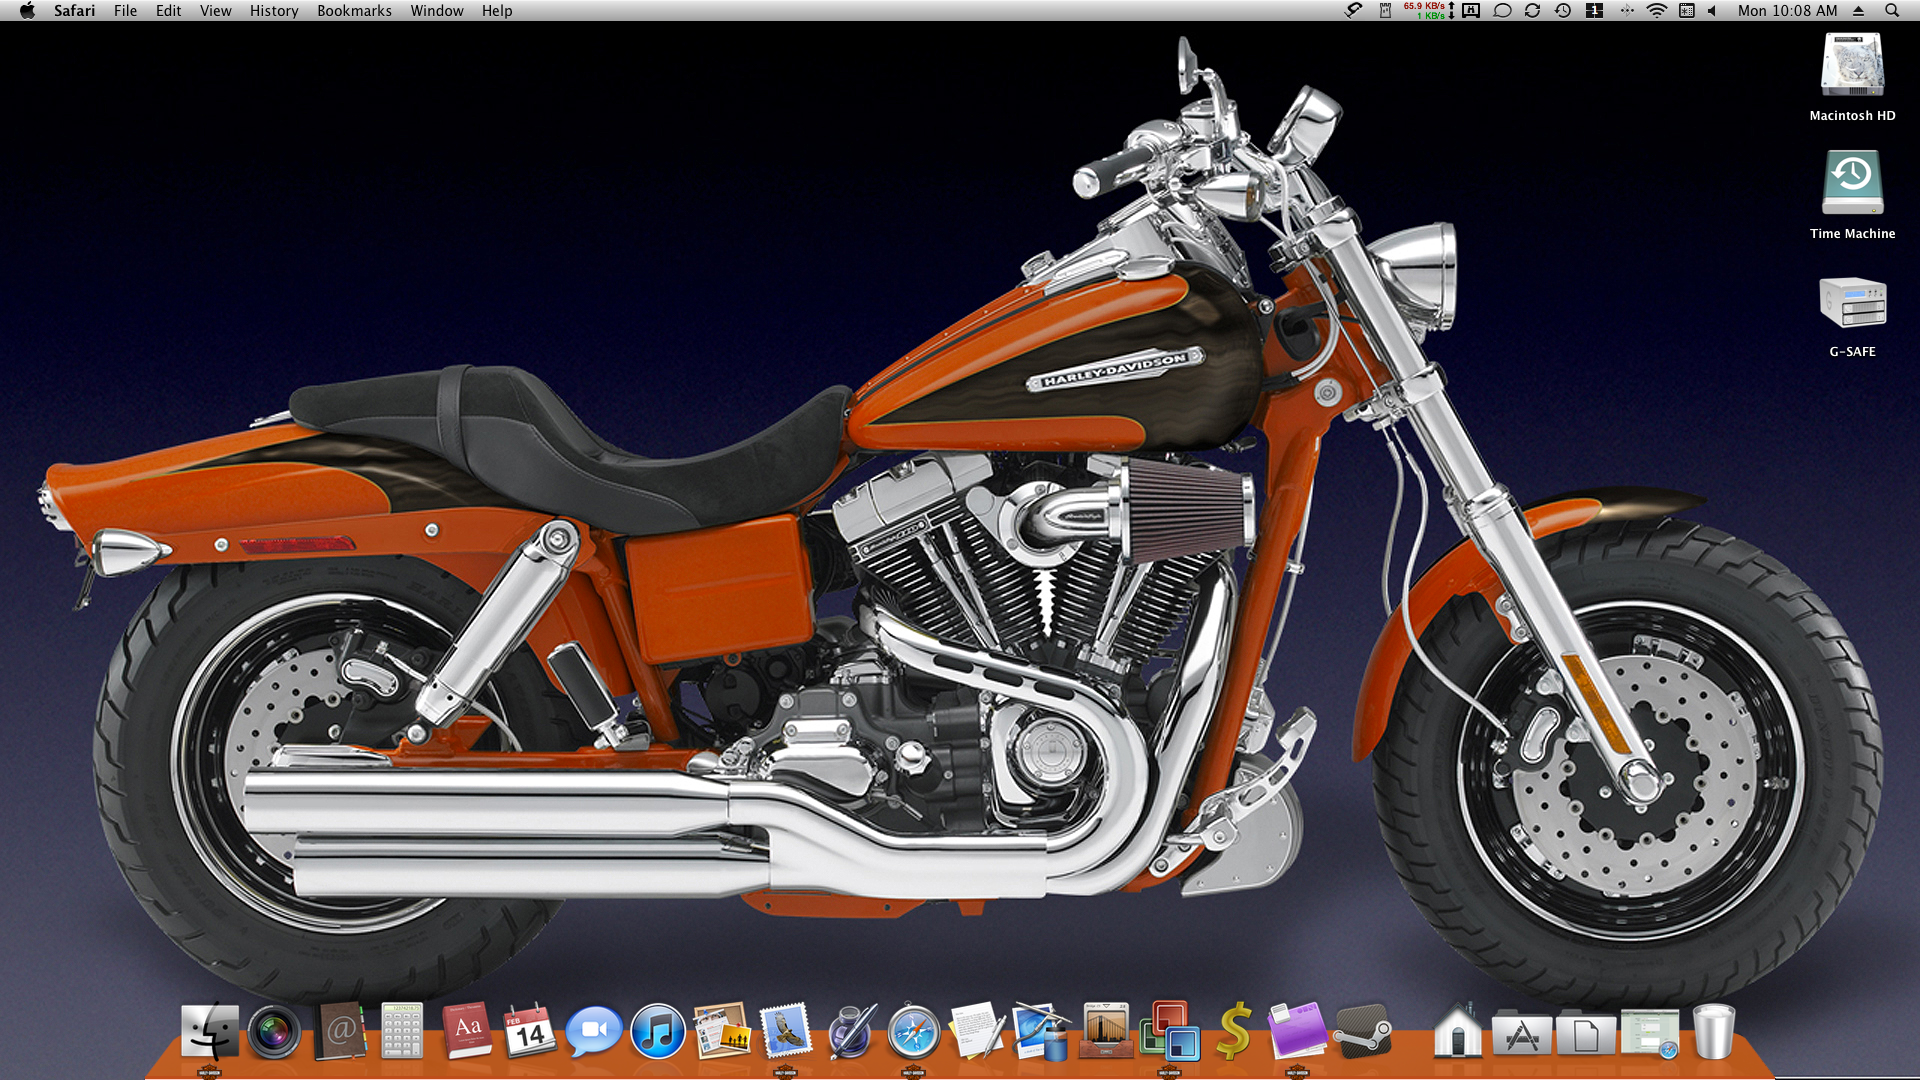 Screamin Eagle Harley Davidson